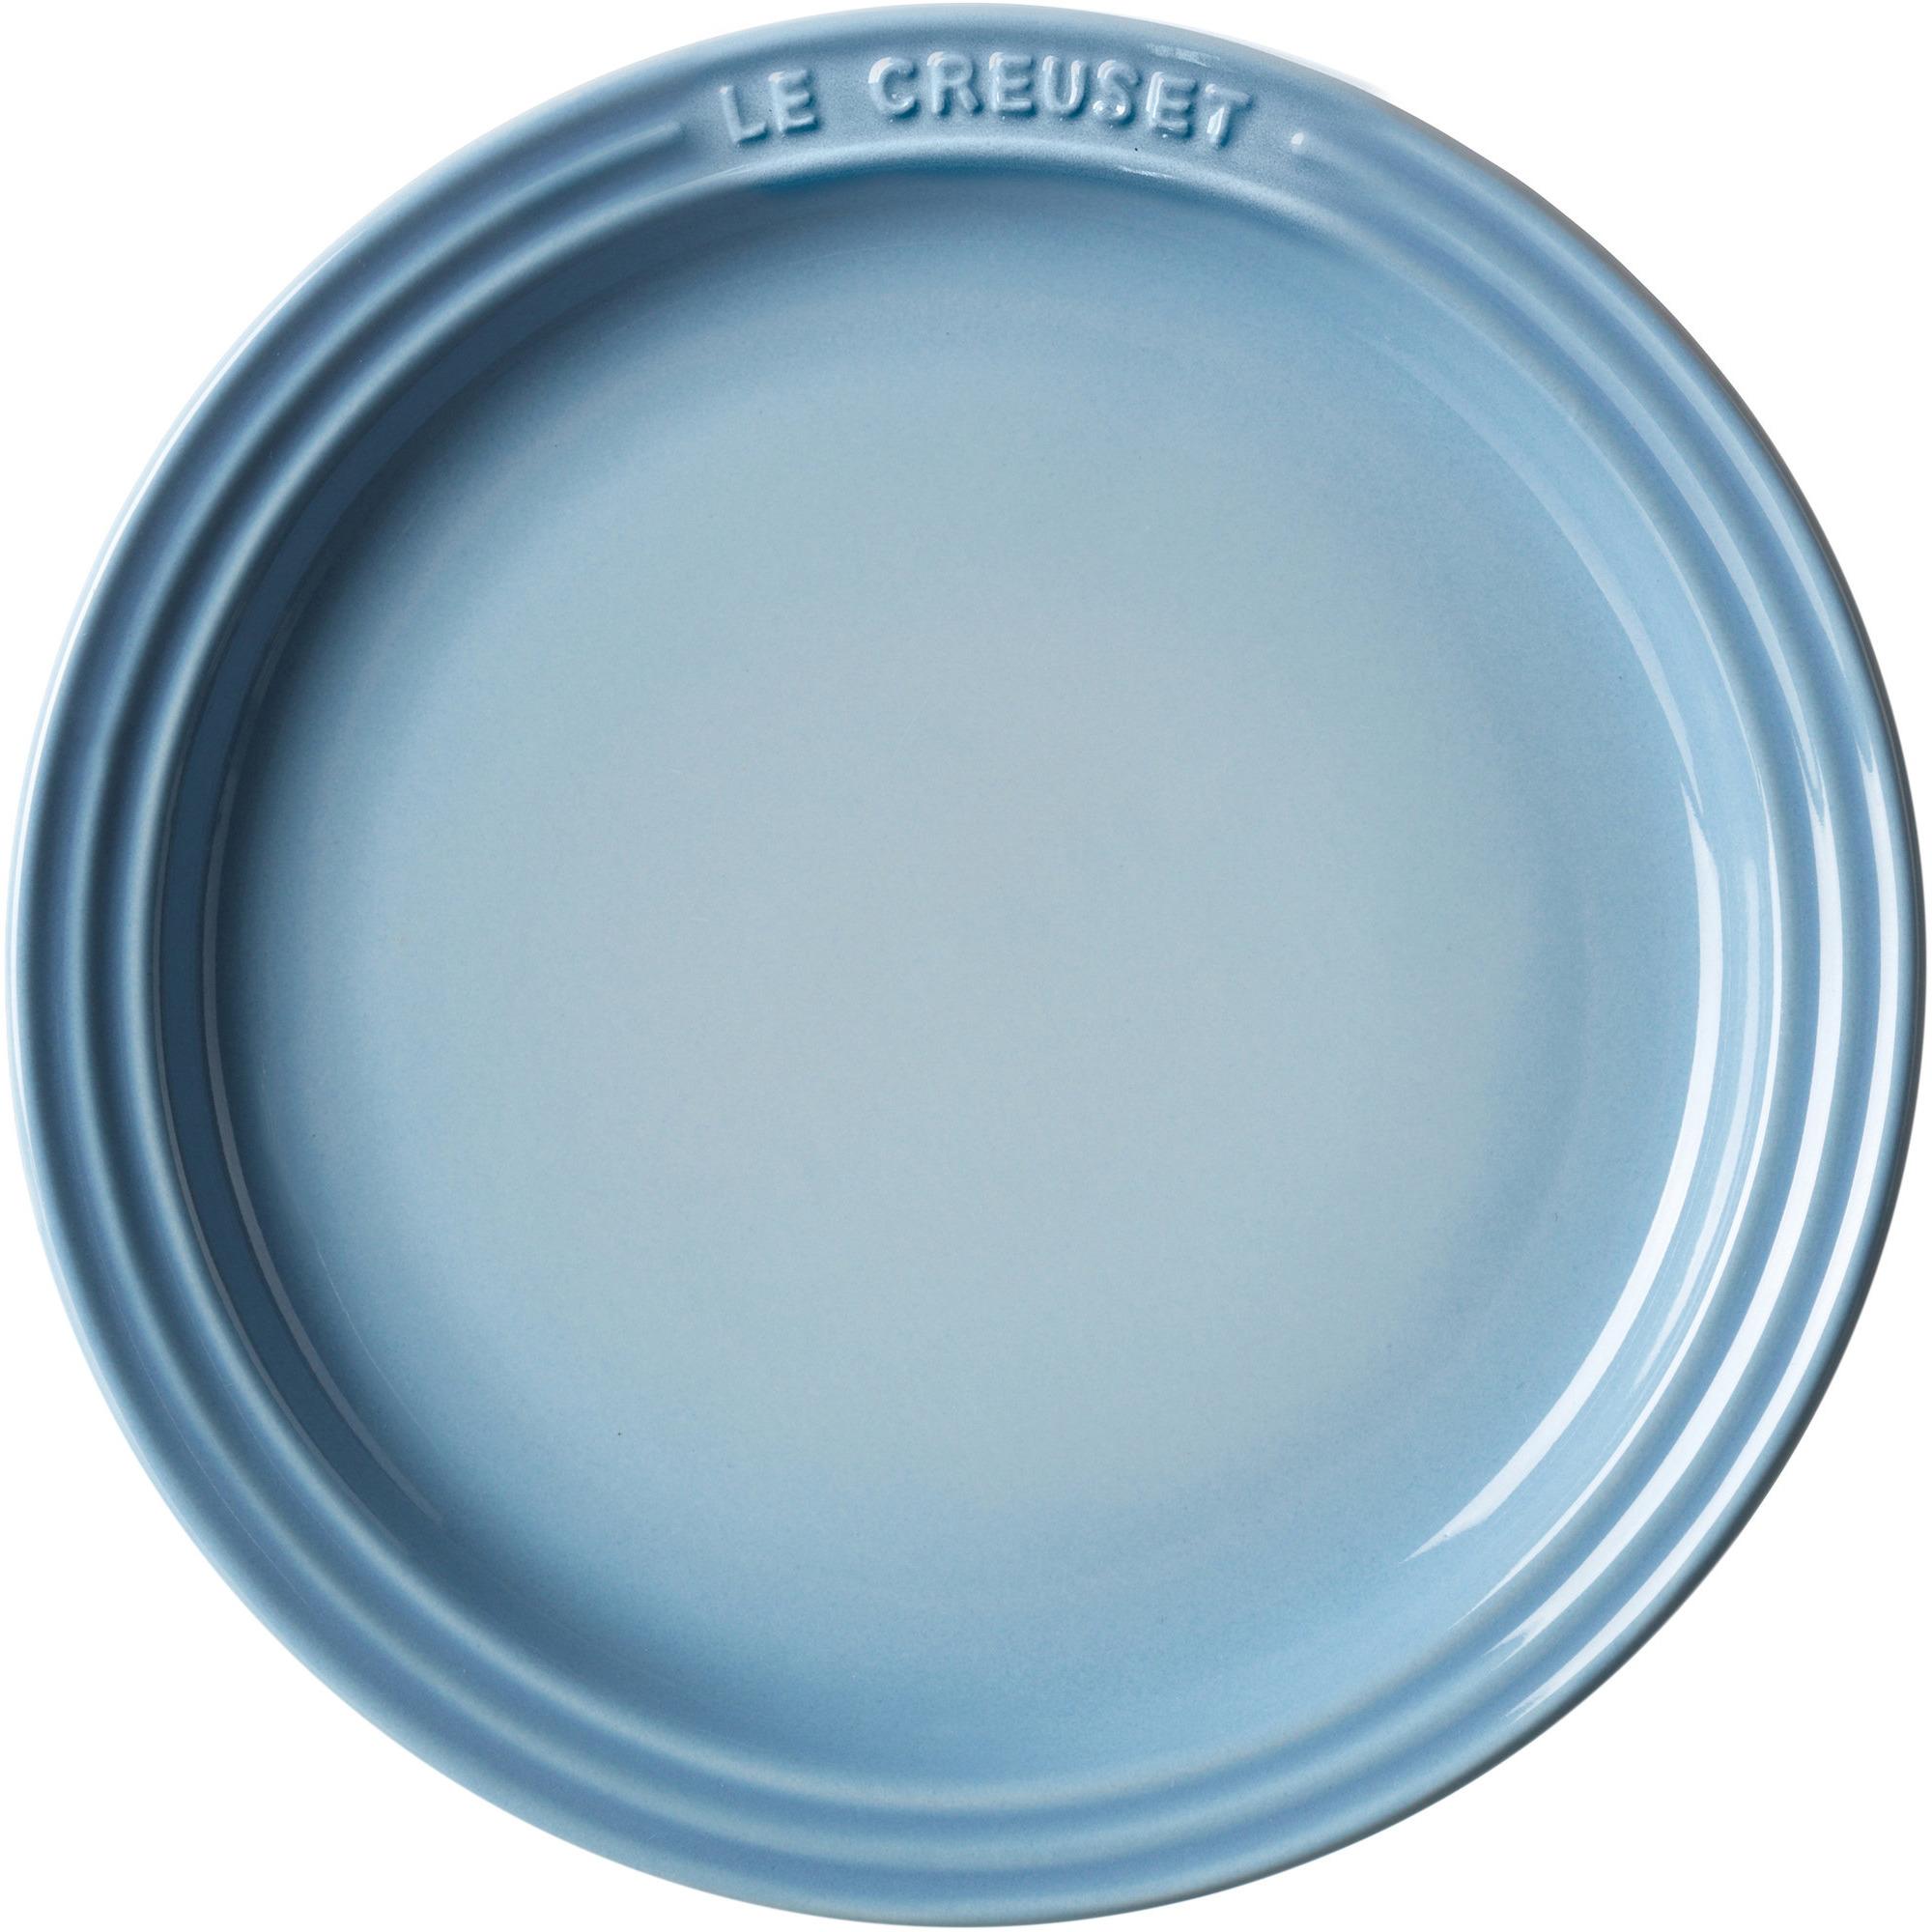 Le Creuset Lunchtallrik 23 cm Coastal Blue